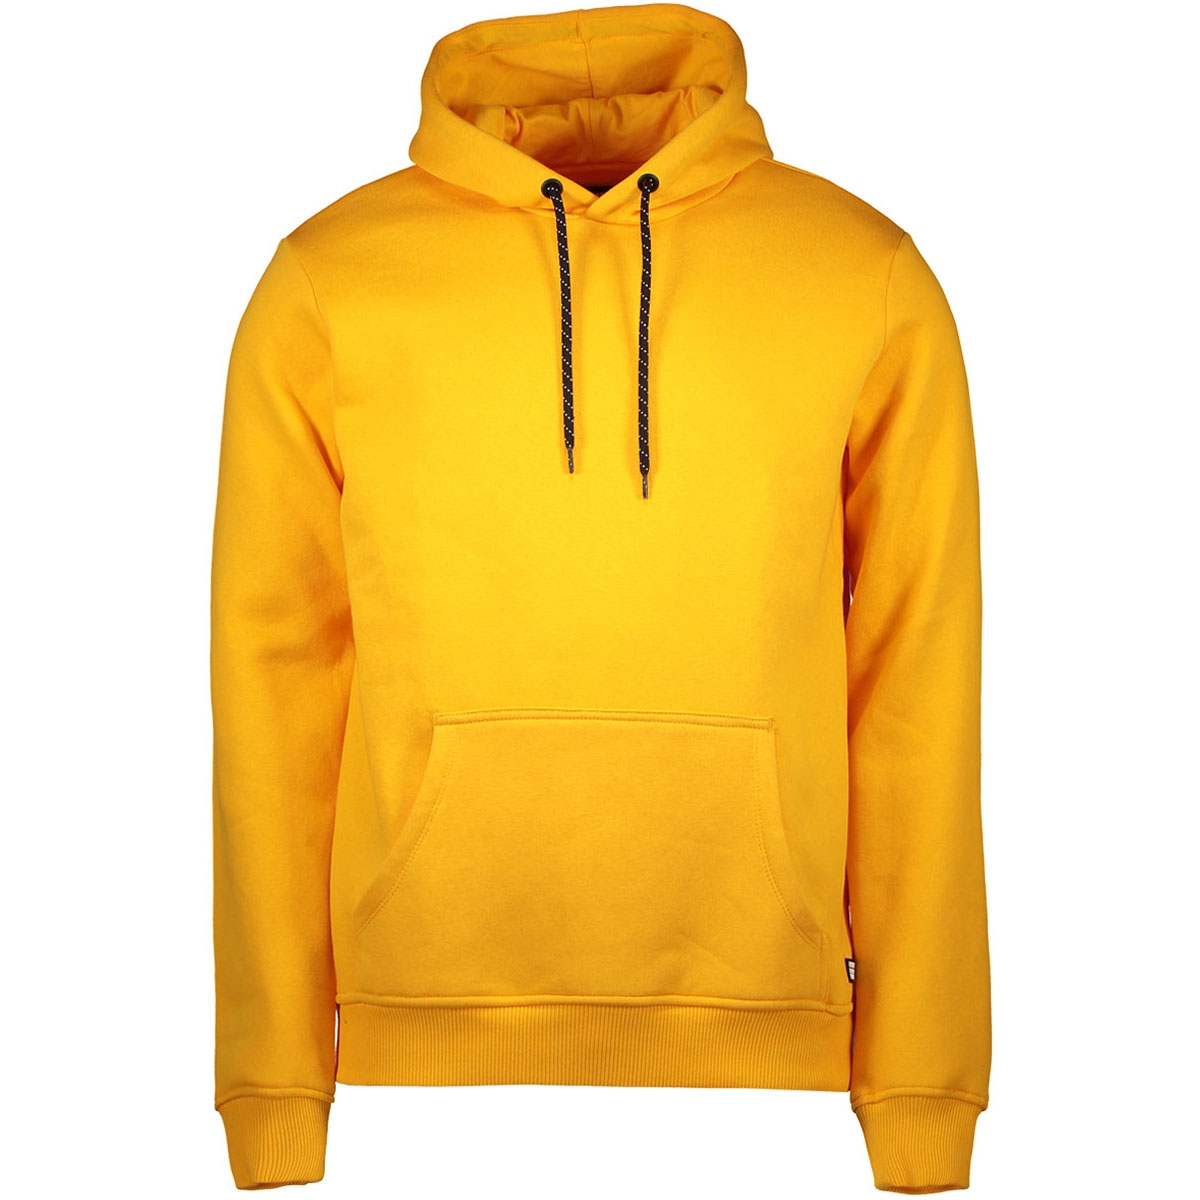 kimar hood sw 4037929 cars sweater ocre